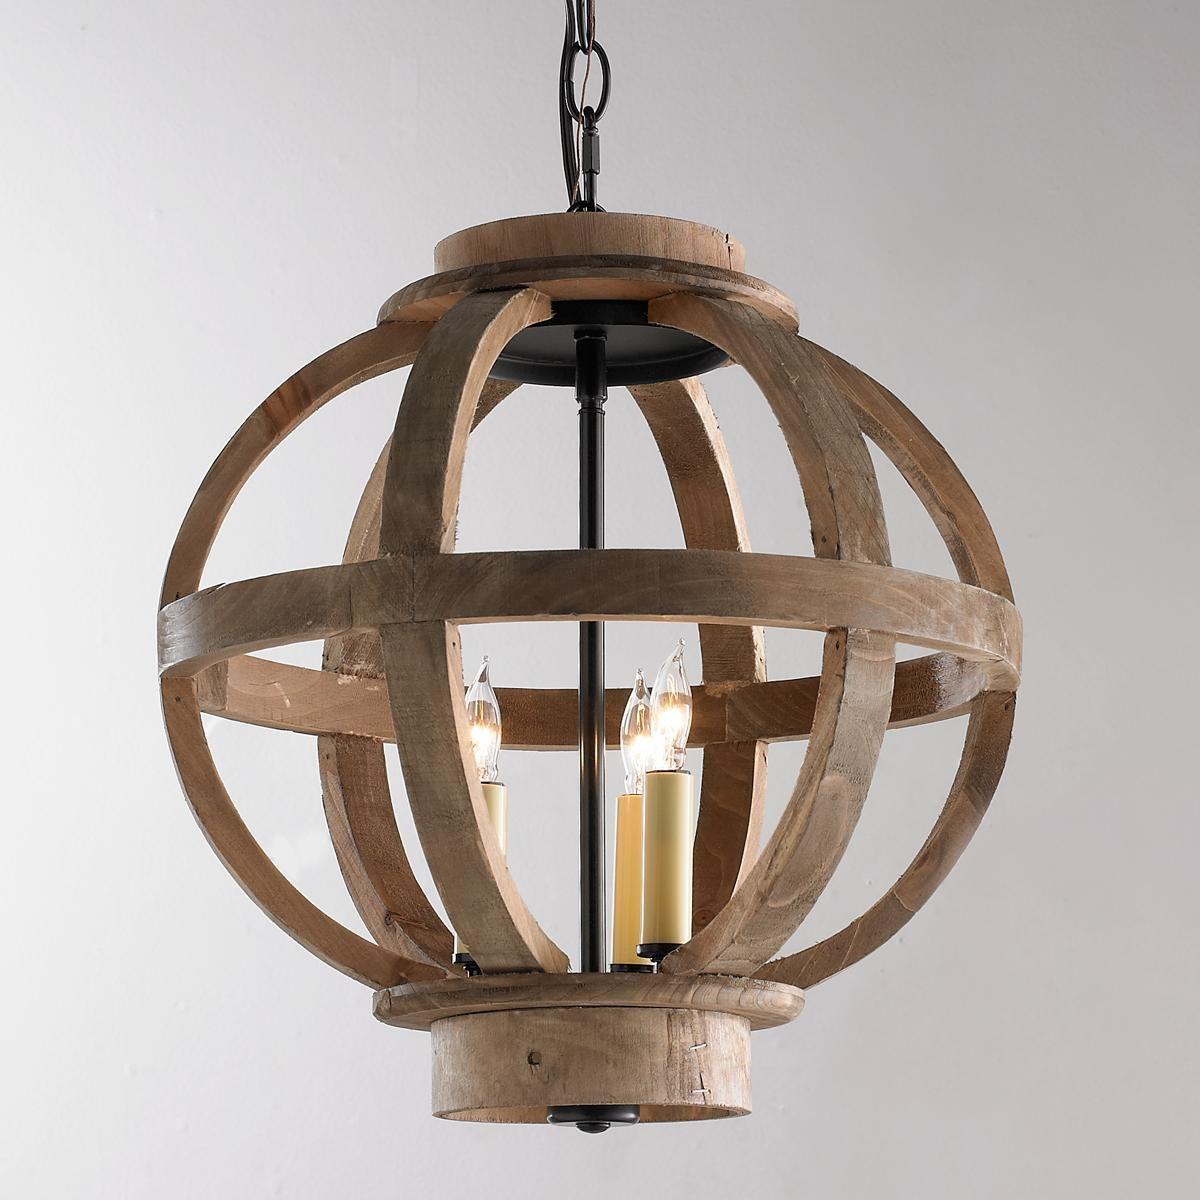 Mini Wood Globe Lantern Rustic Pendant Lighting Single Pendant Lighting Small Chandelier